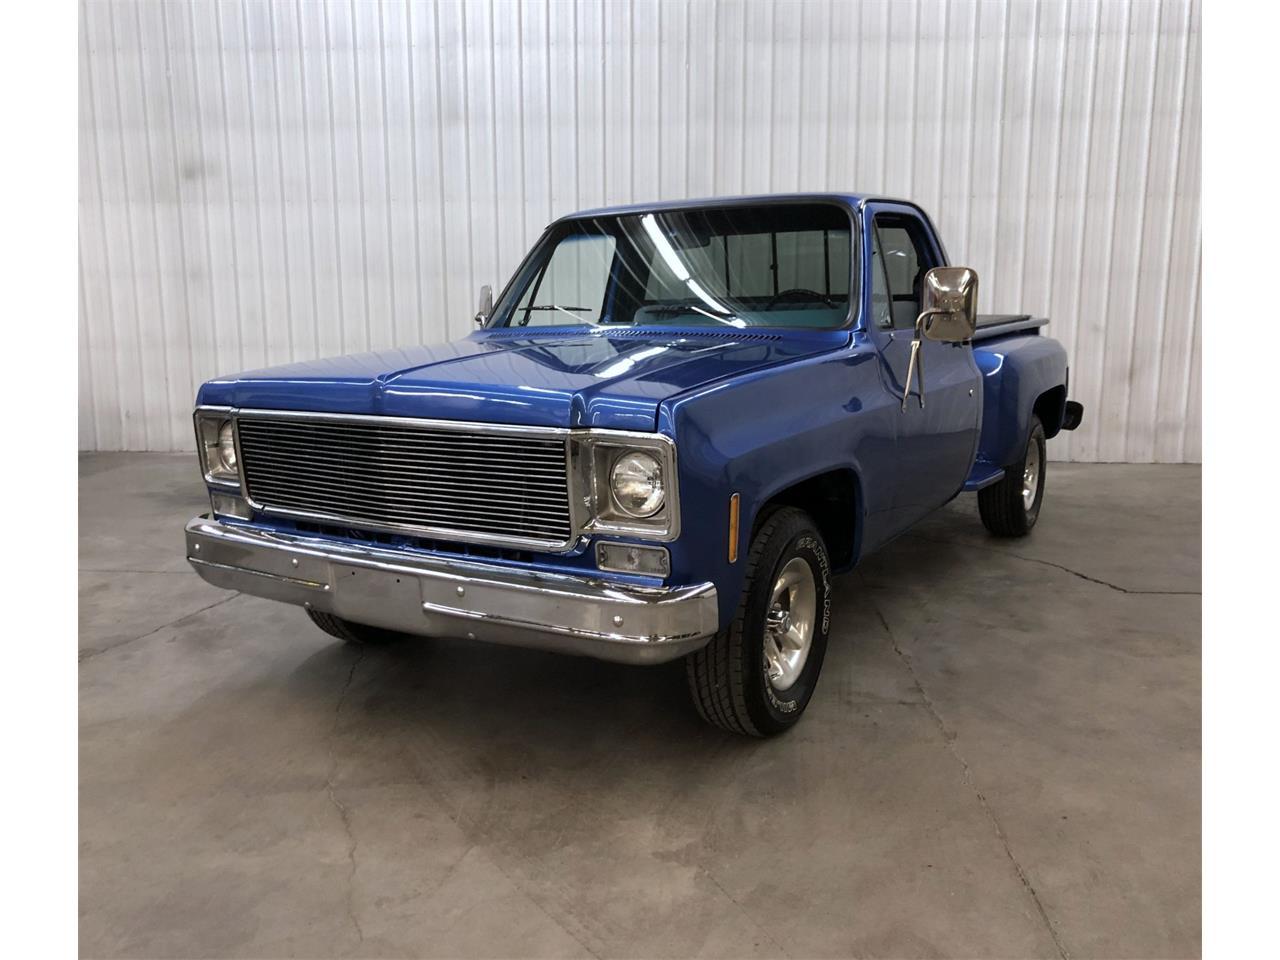 1978 Chevrolet C10 (CC-1319328) for sale in Maple Lake, Minnesota